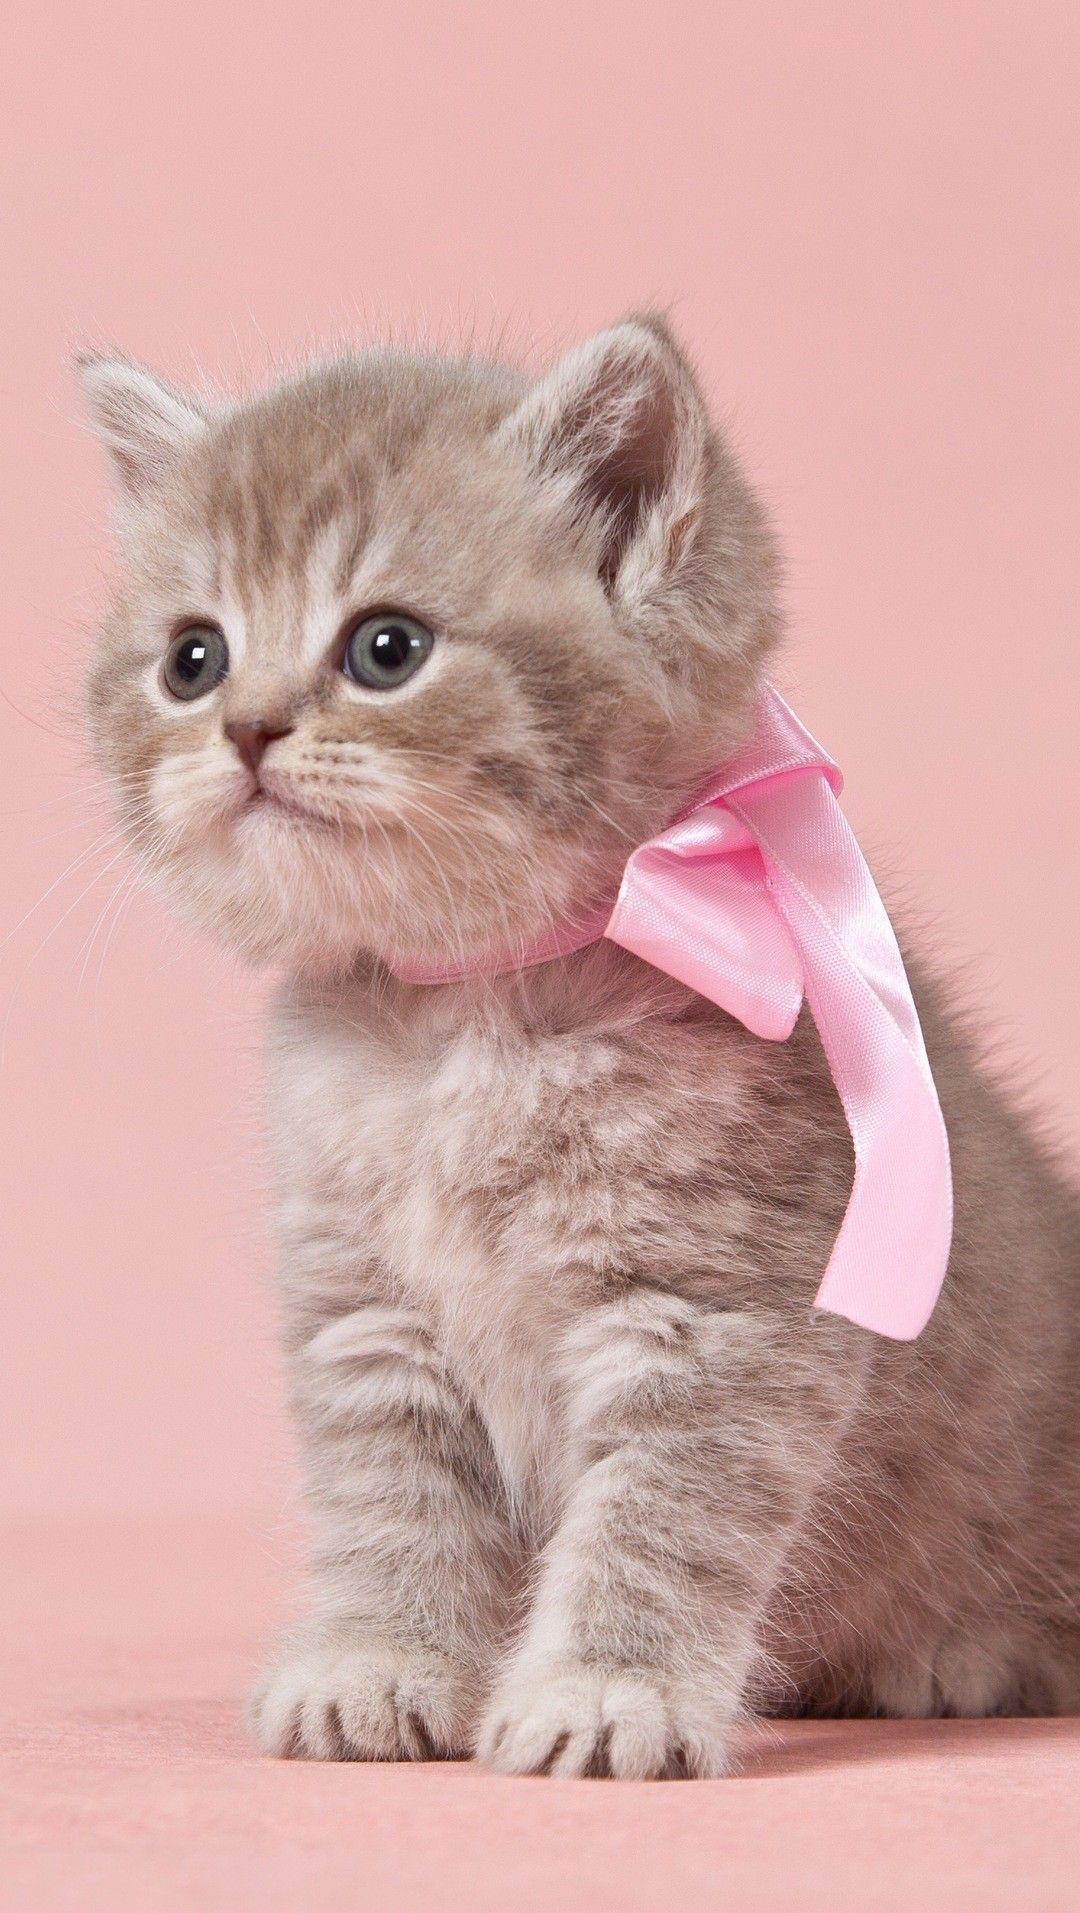 Pin By Nata Gulieva On Oboi Fony Risunki Dlya Telefona In 2020 Cats Cute Cats And Kittens Kittens